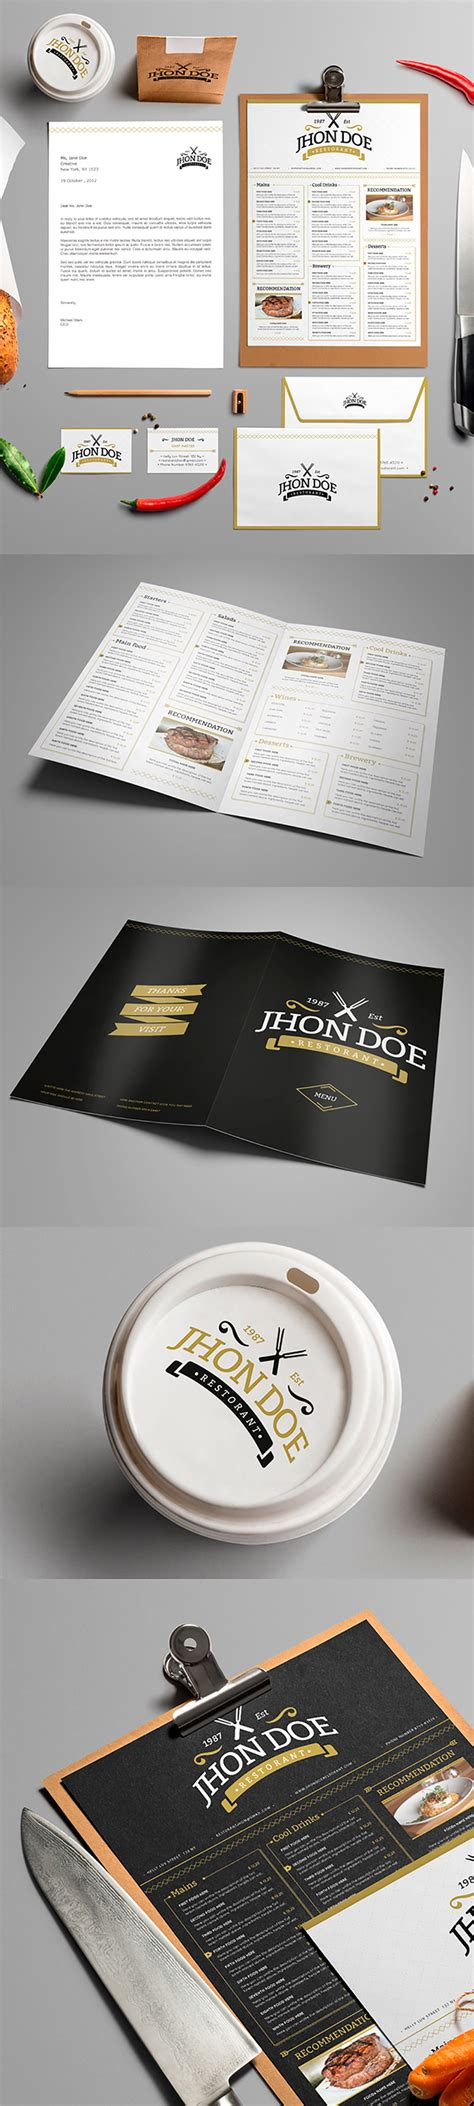 Elegant Brand Identity Pack Graphicsfuel